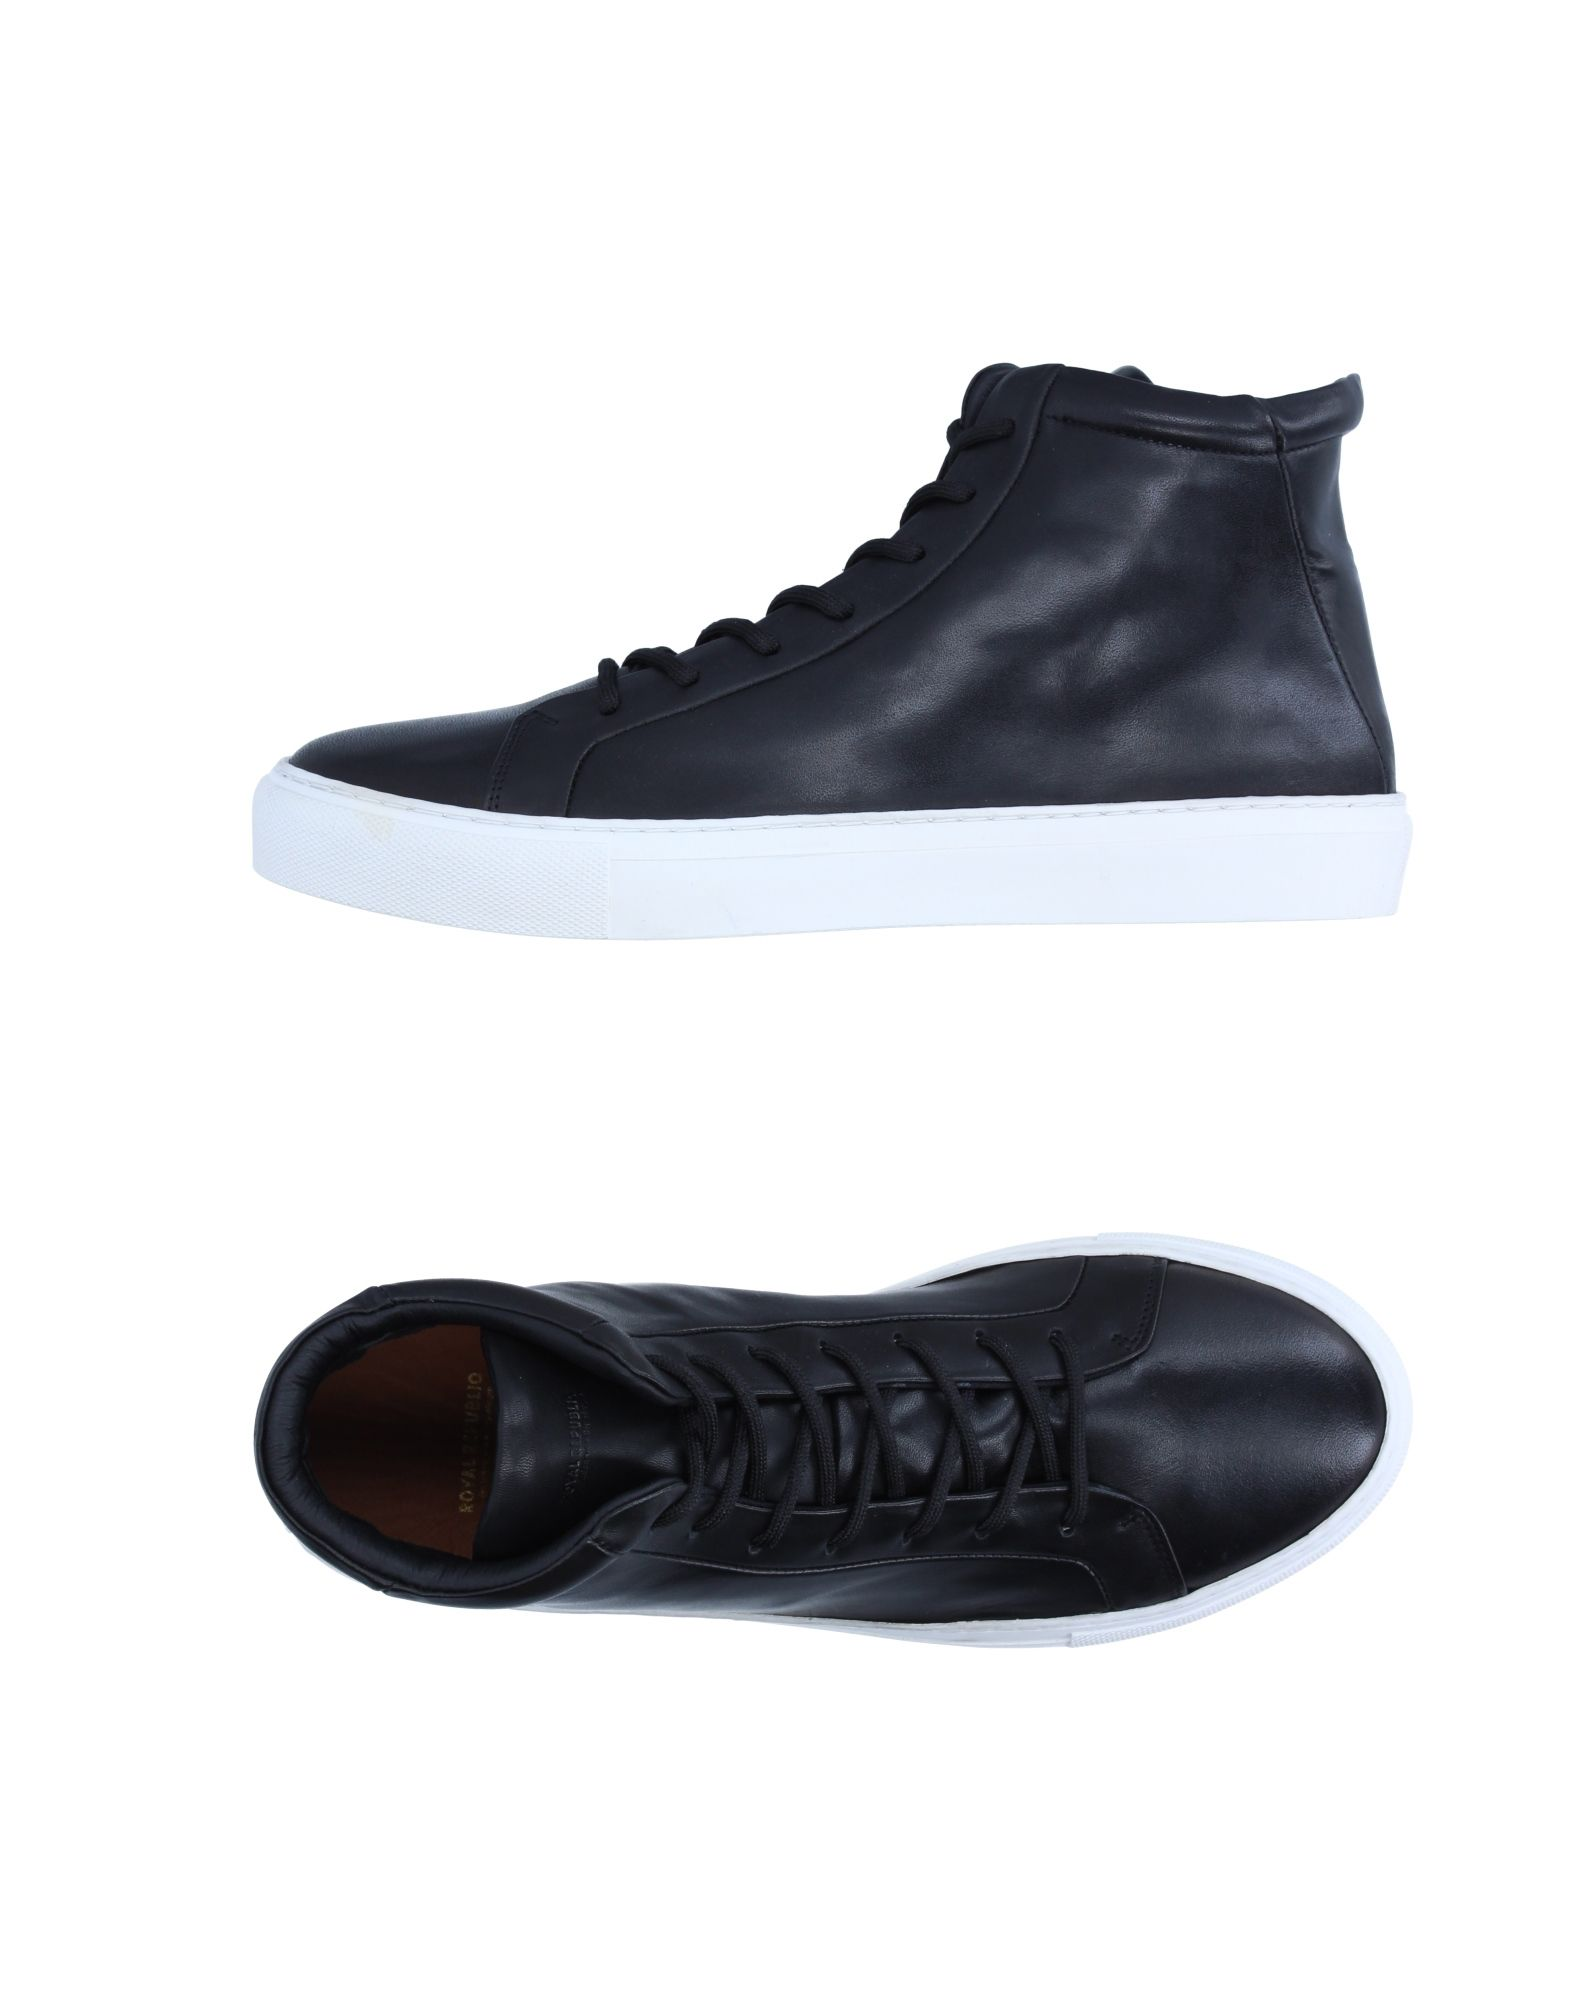 Royal Republiq Gute Sneakers Herren  11254196GS Gute Republiq Qualität beliebte Schuhe 0014f2